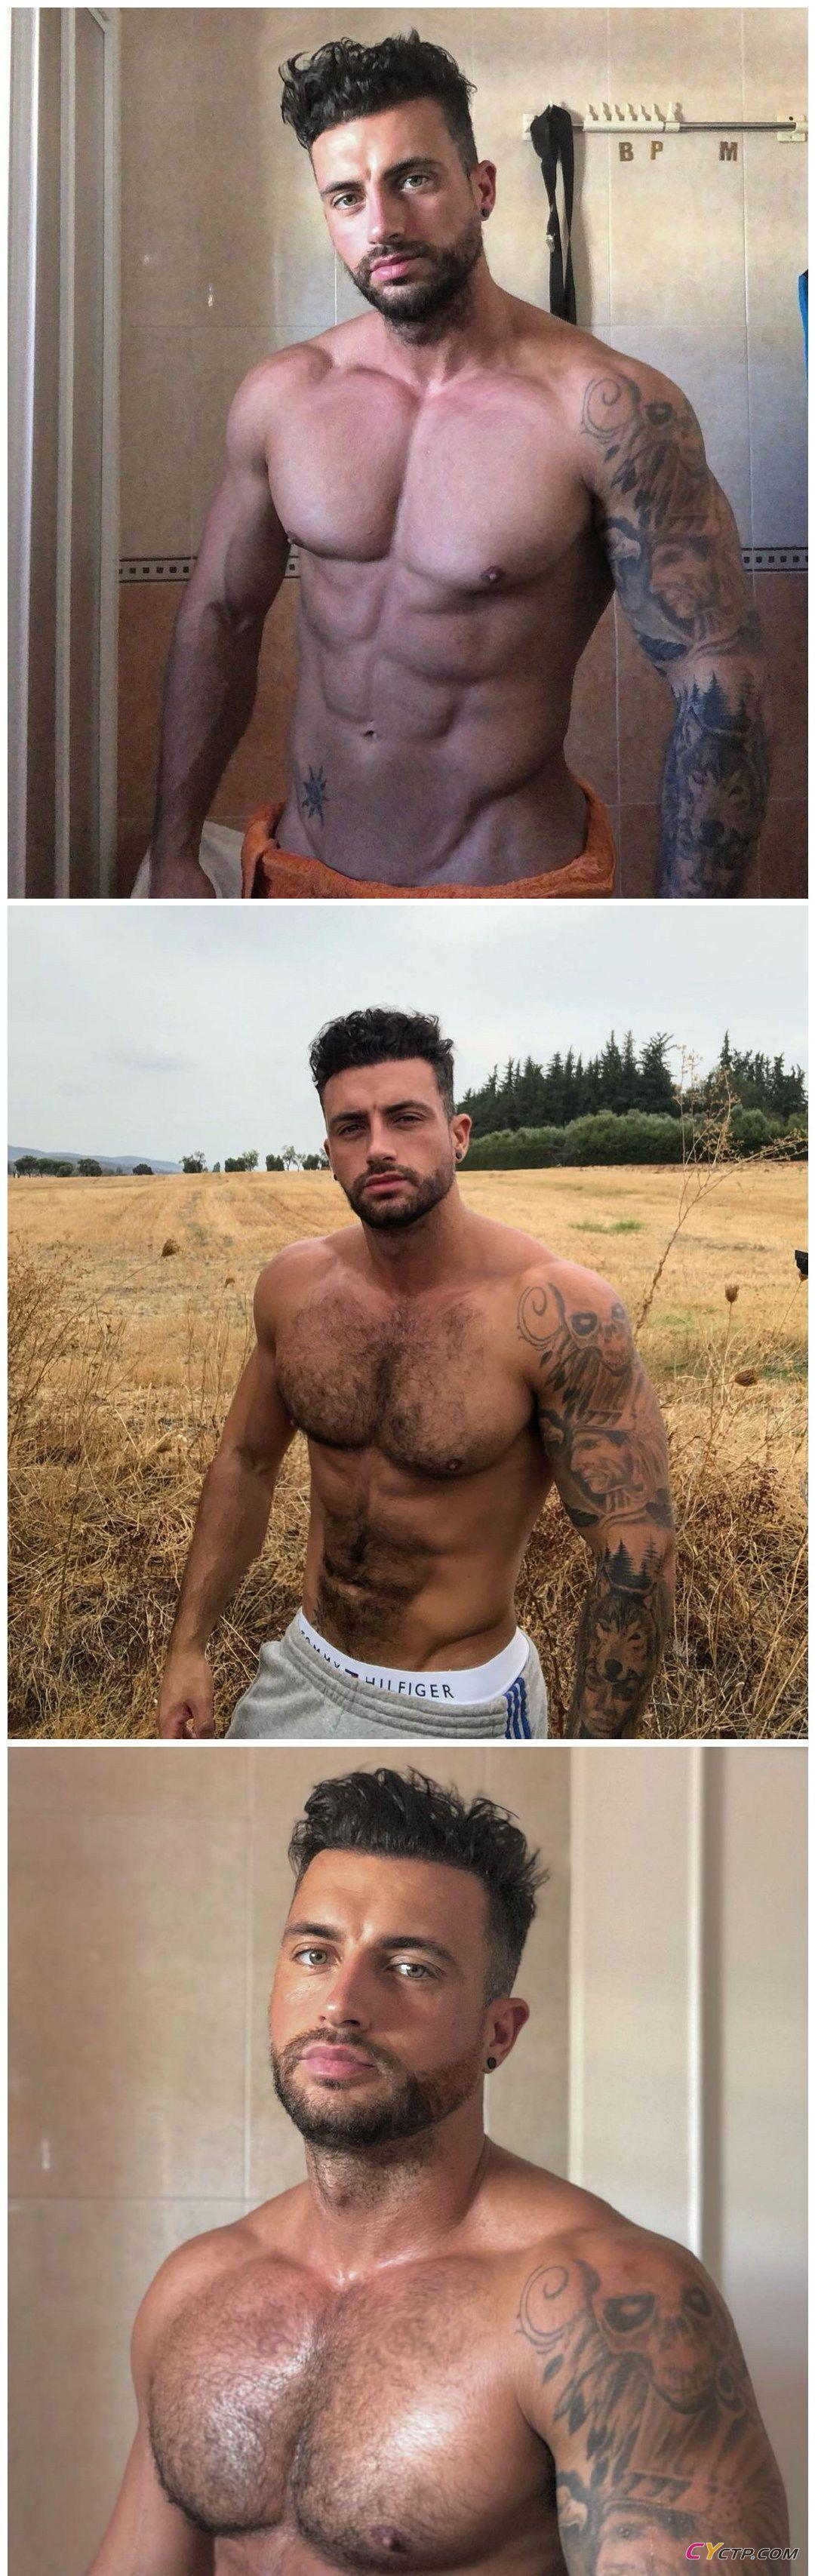 gv网站性感欧美肌肉男图片